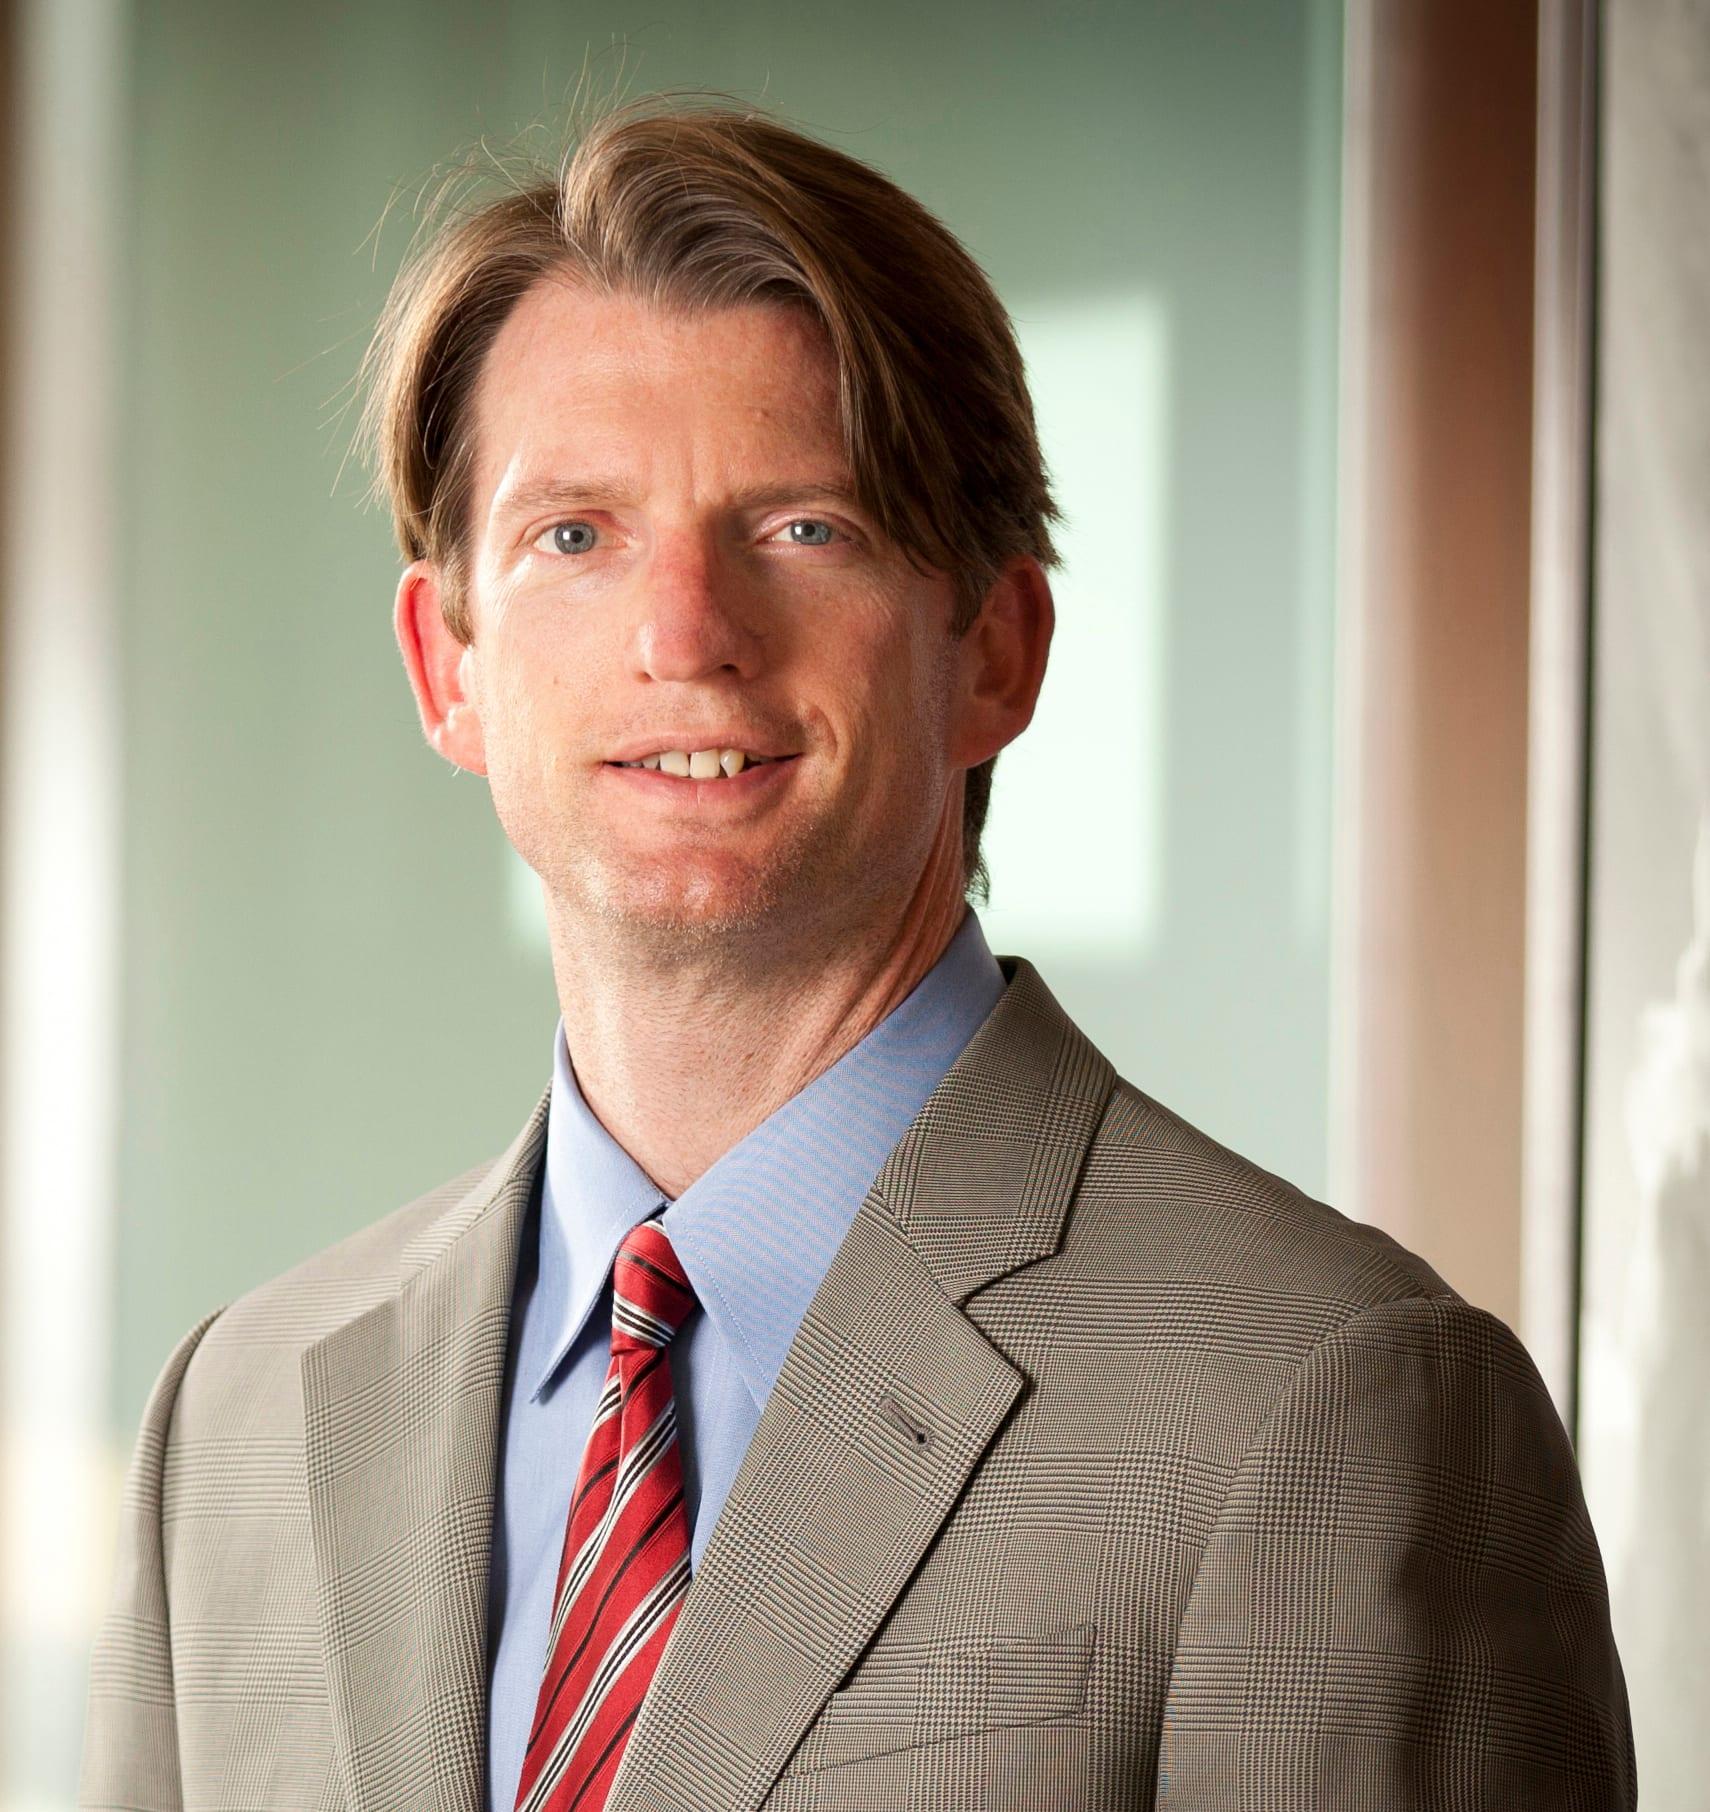 Dr. Thomas J Cartwright MD